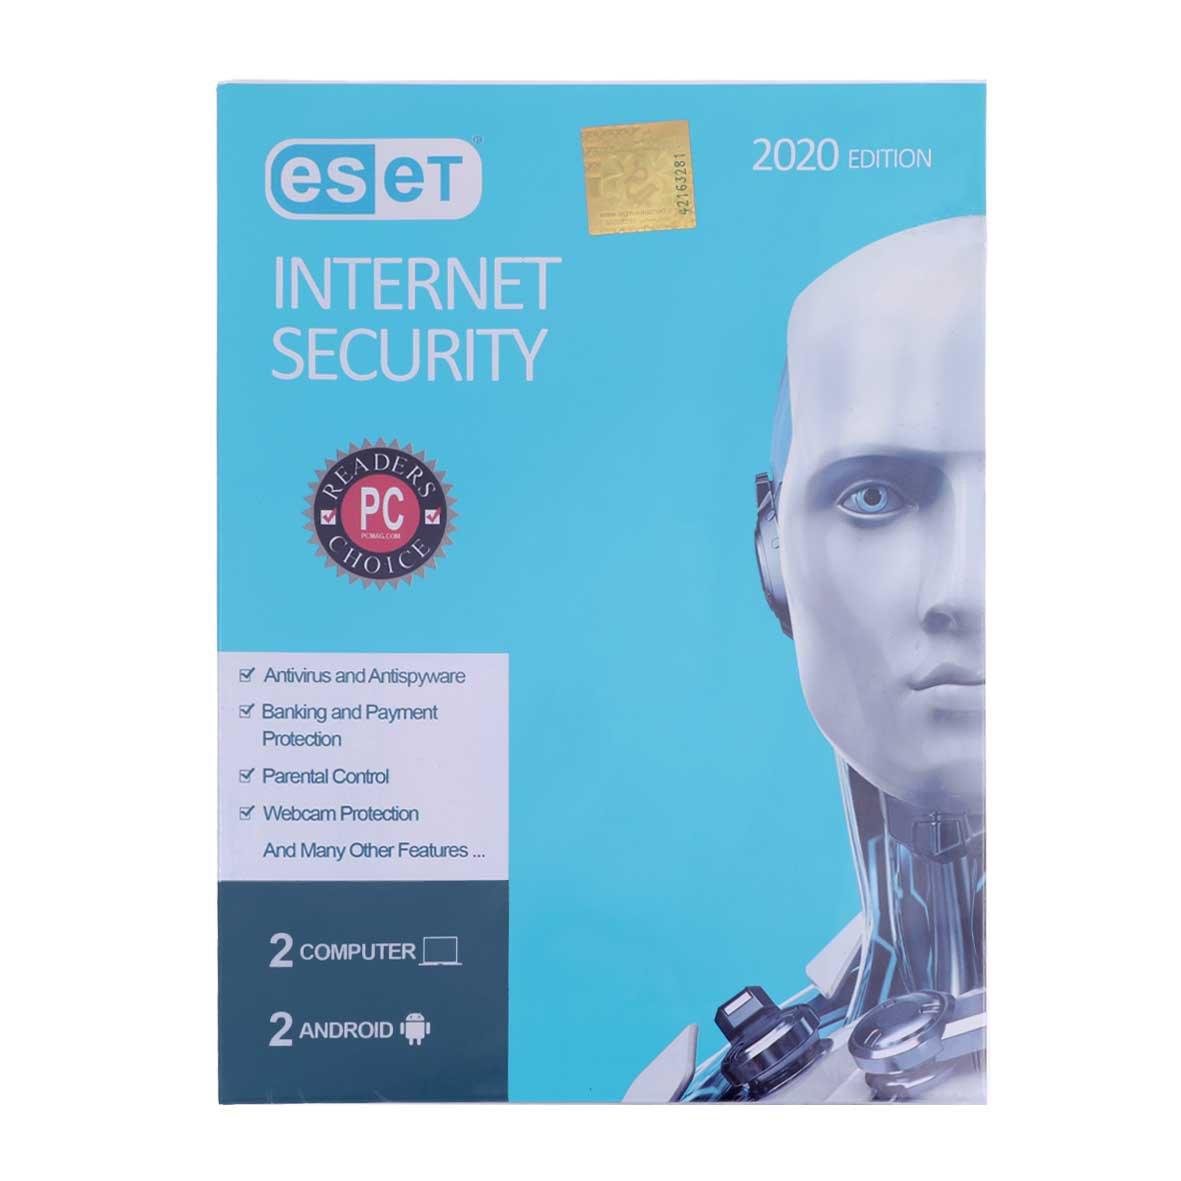 آنتی ویروس ESET INTERNET Security 2020 اورجینال یکساله (2 PC 2 + Android)